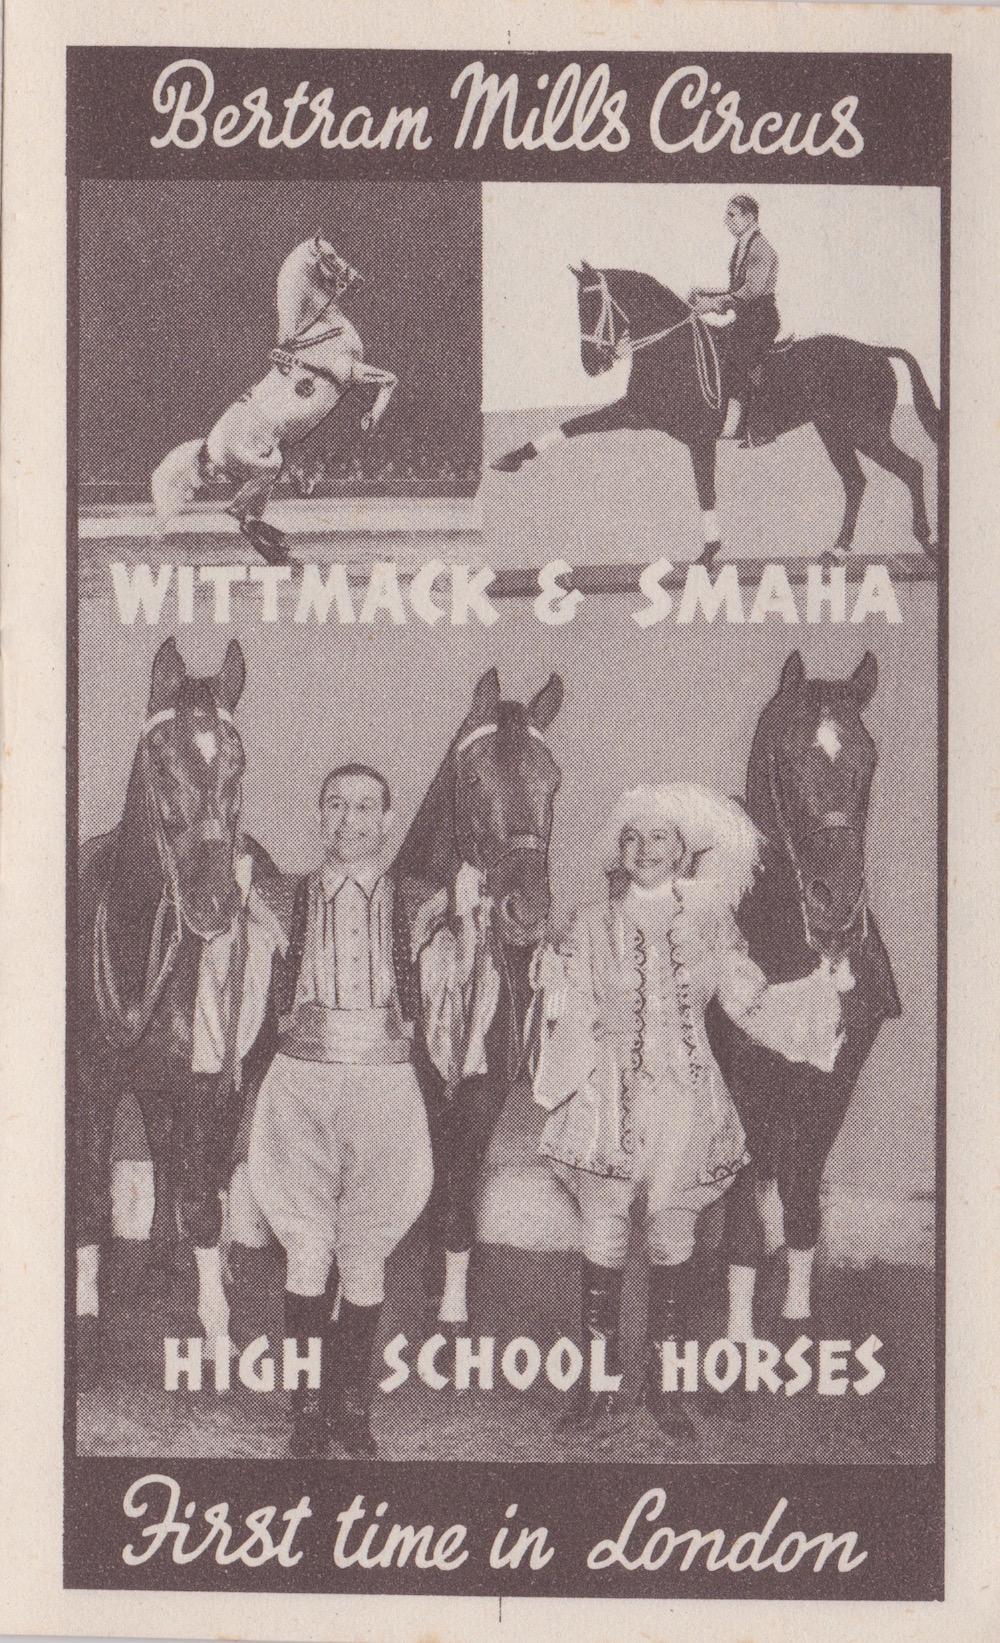 Bertram Mills Circus Dec 17 1948 Wittmack and Smaha High School Horses